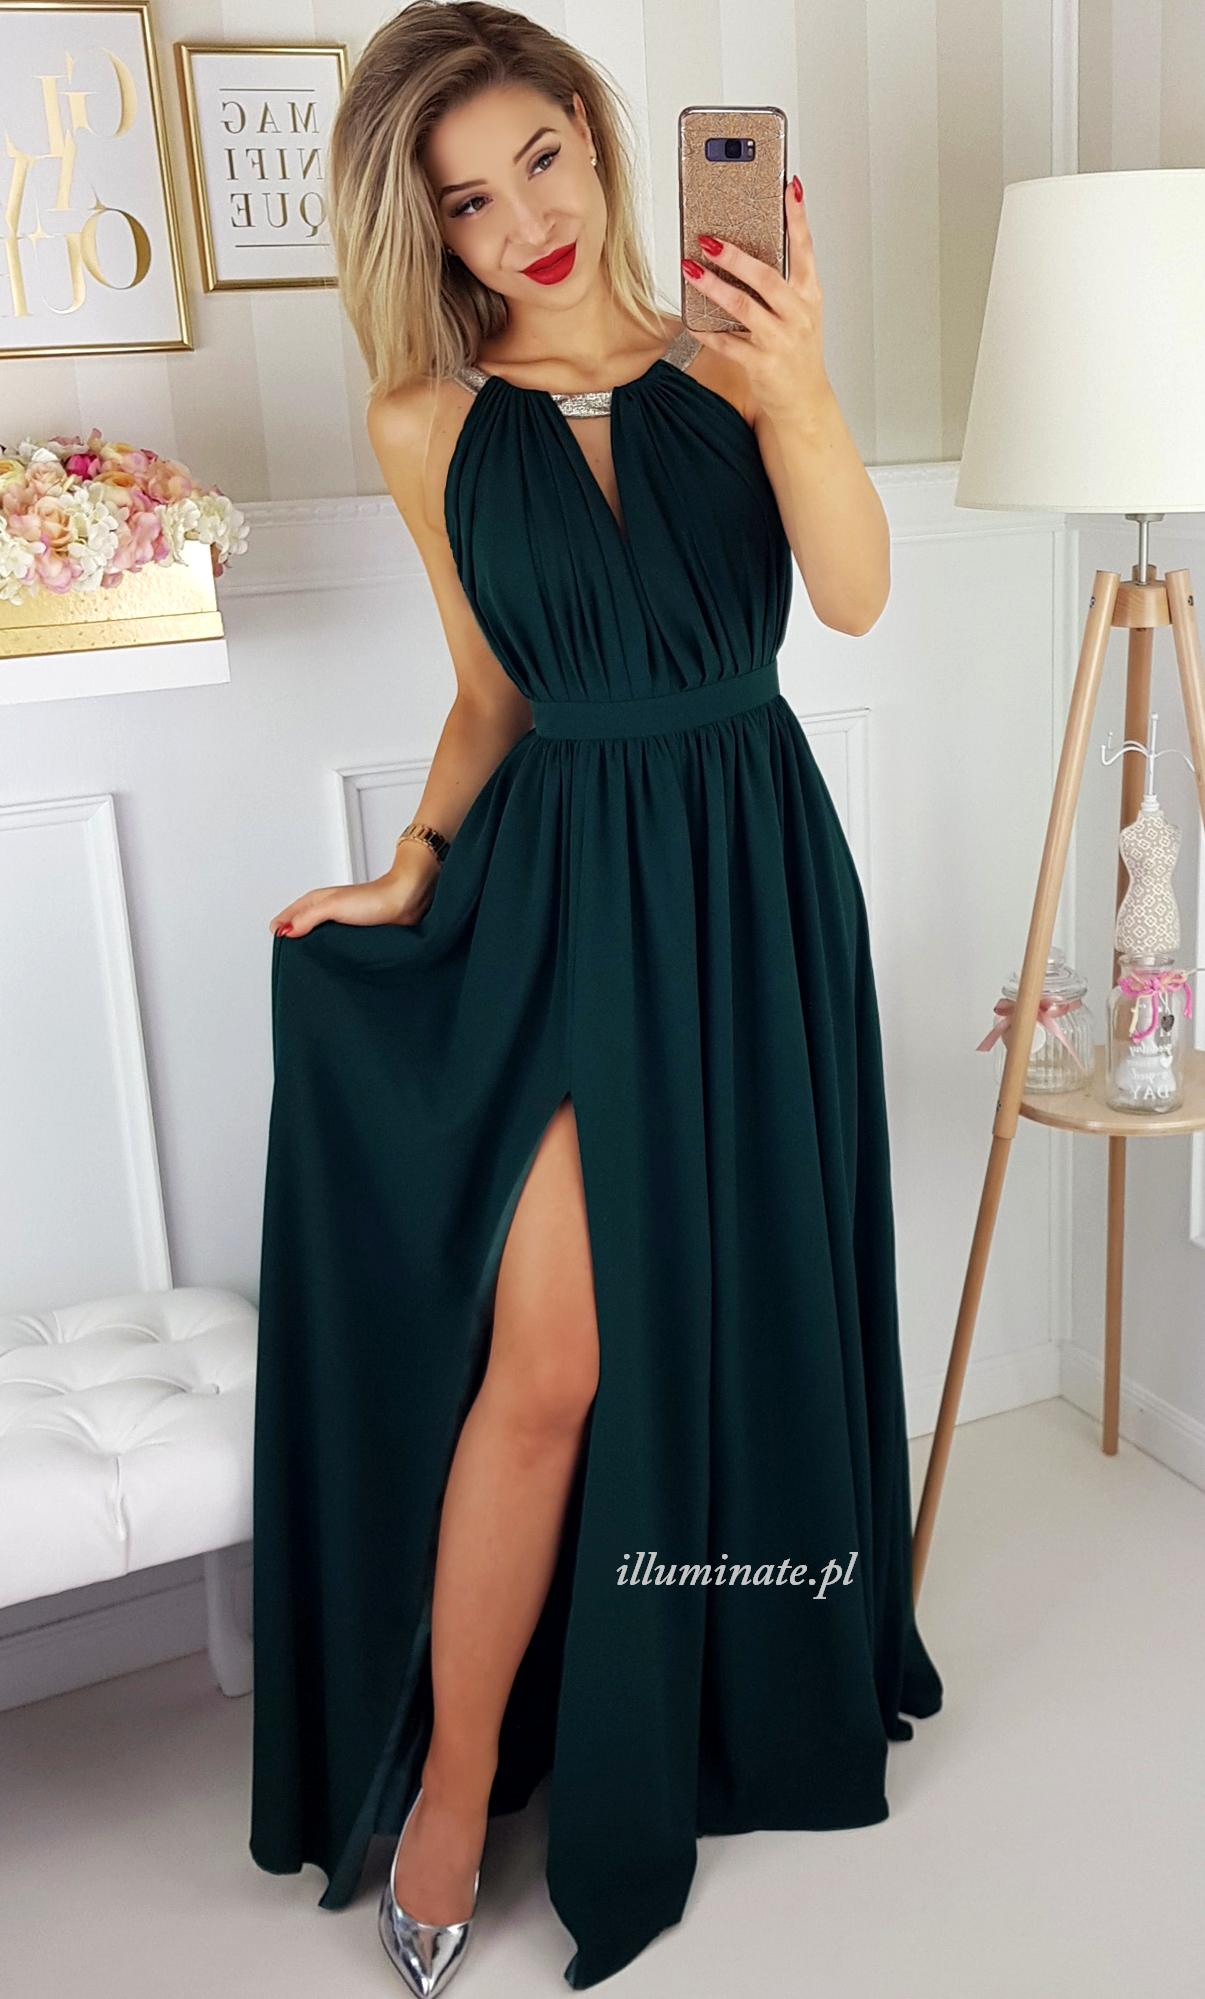 Elisa Dluga Sukienka Butelkowa Zielen Sklep Illuminate 389zl Prom Dresses Sleeveless Prom Dresses Chiffon Prom Dress